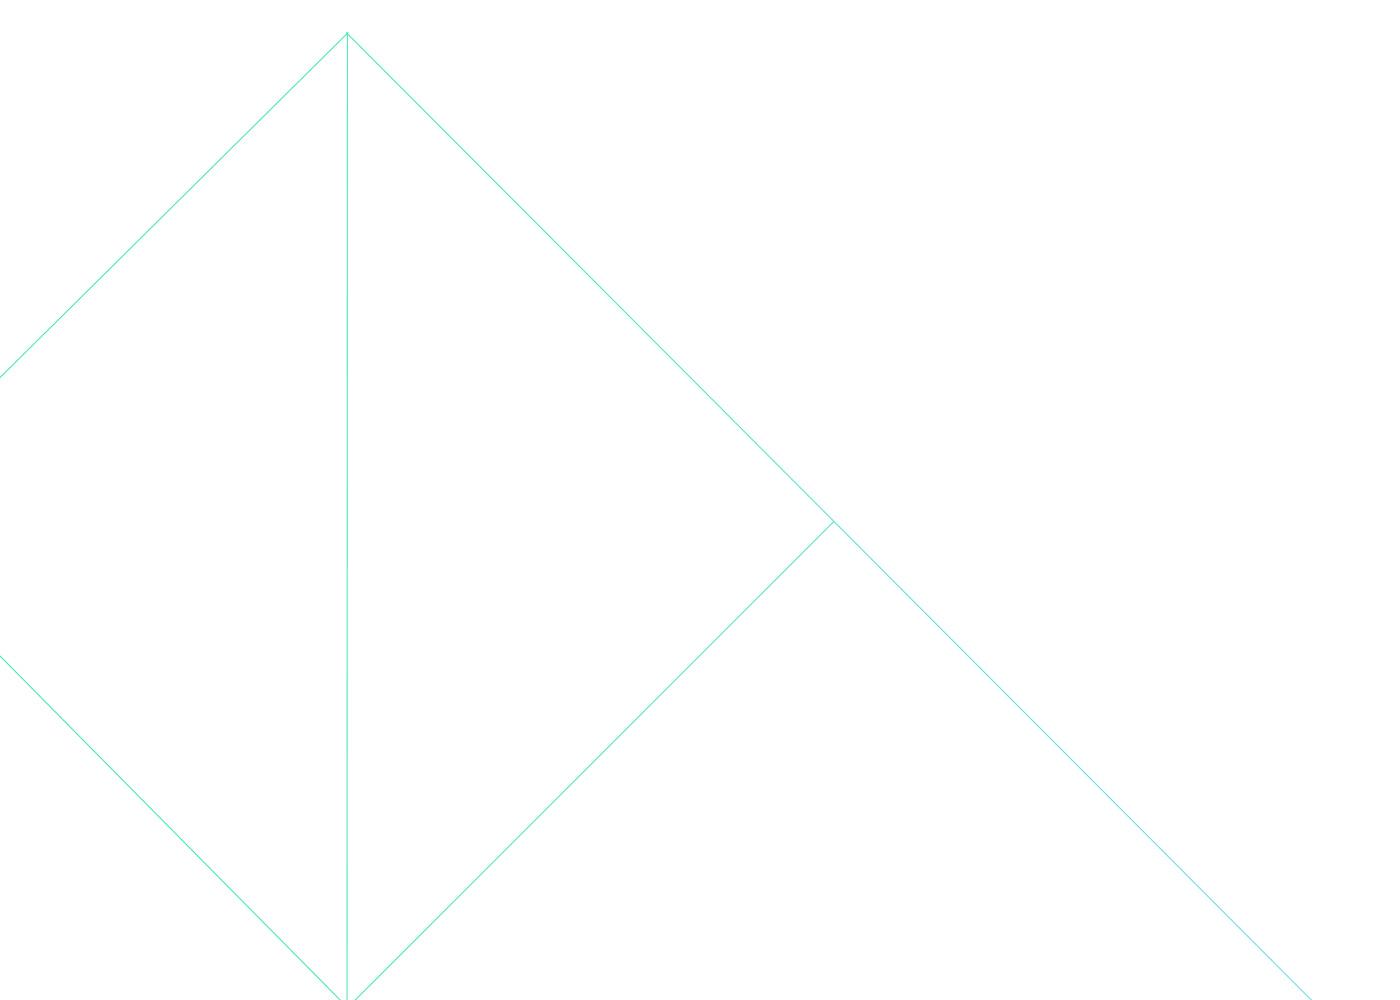 framework-image-02